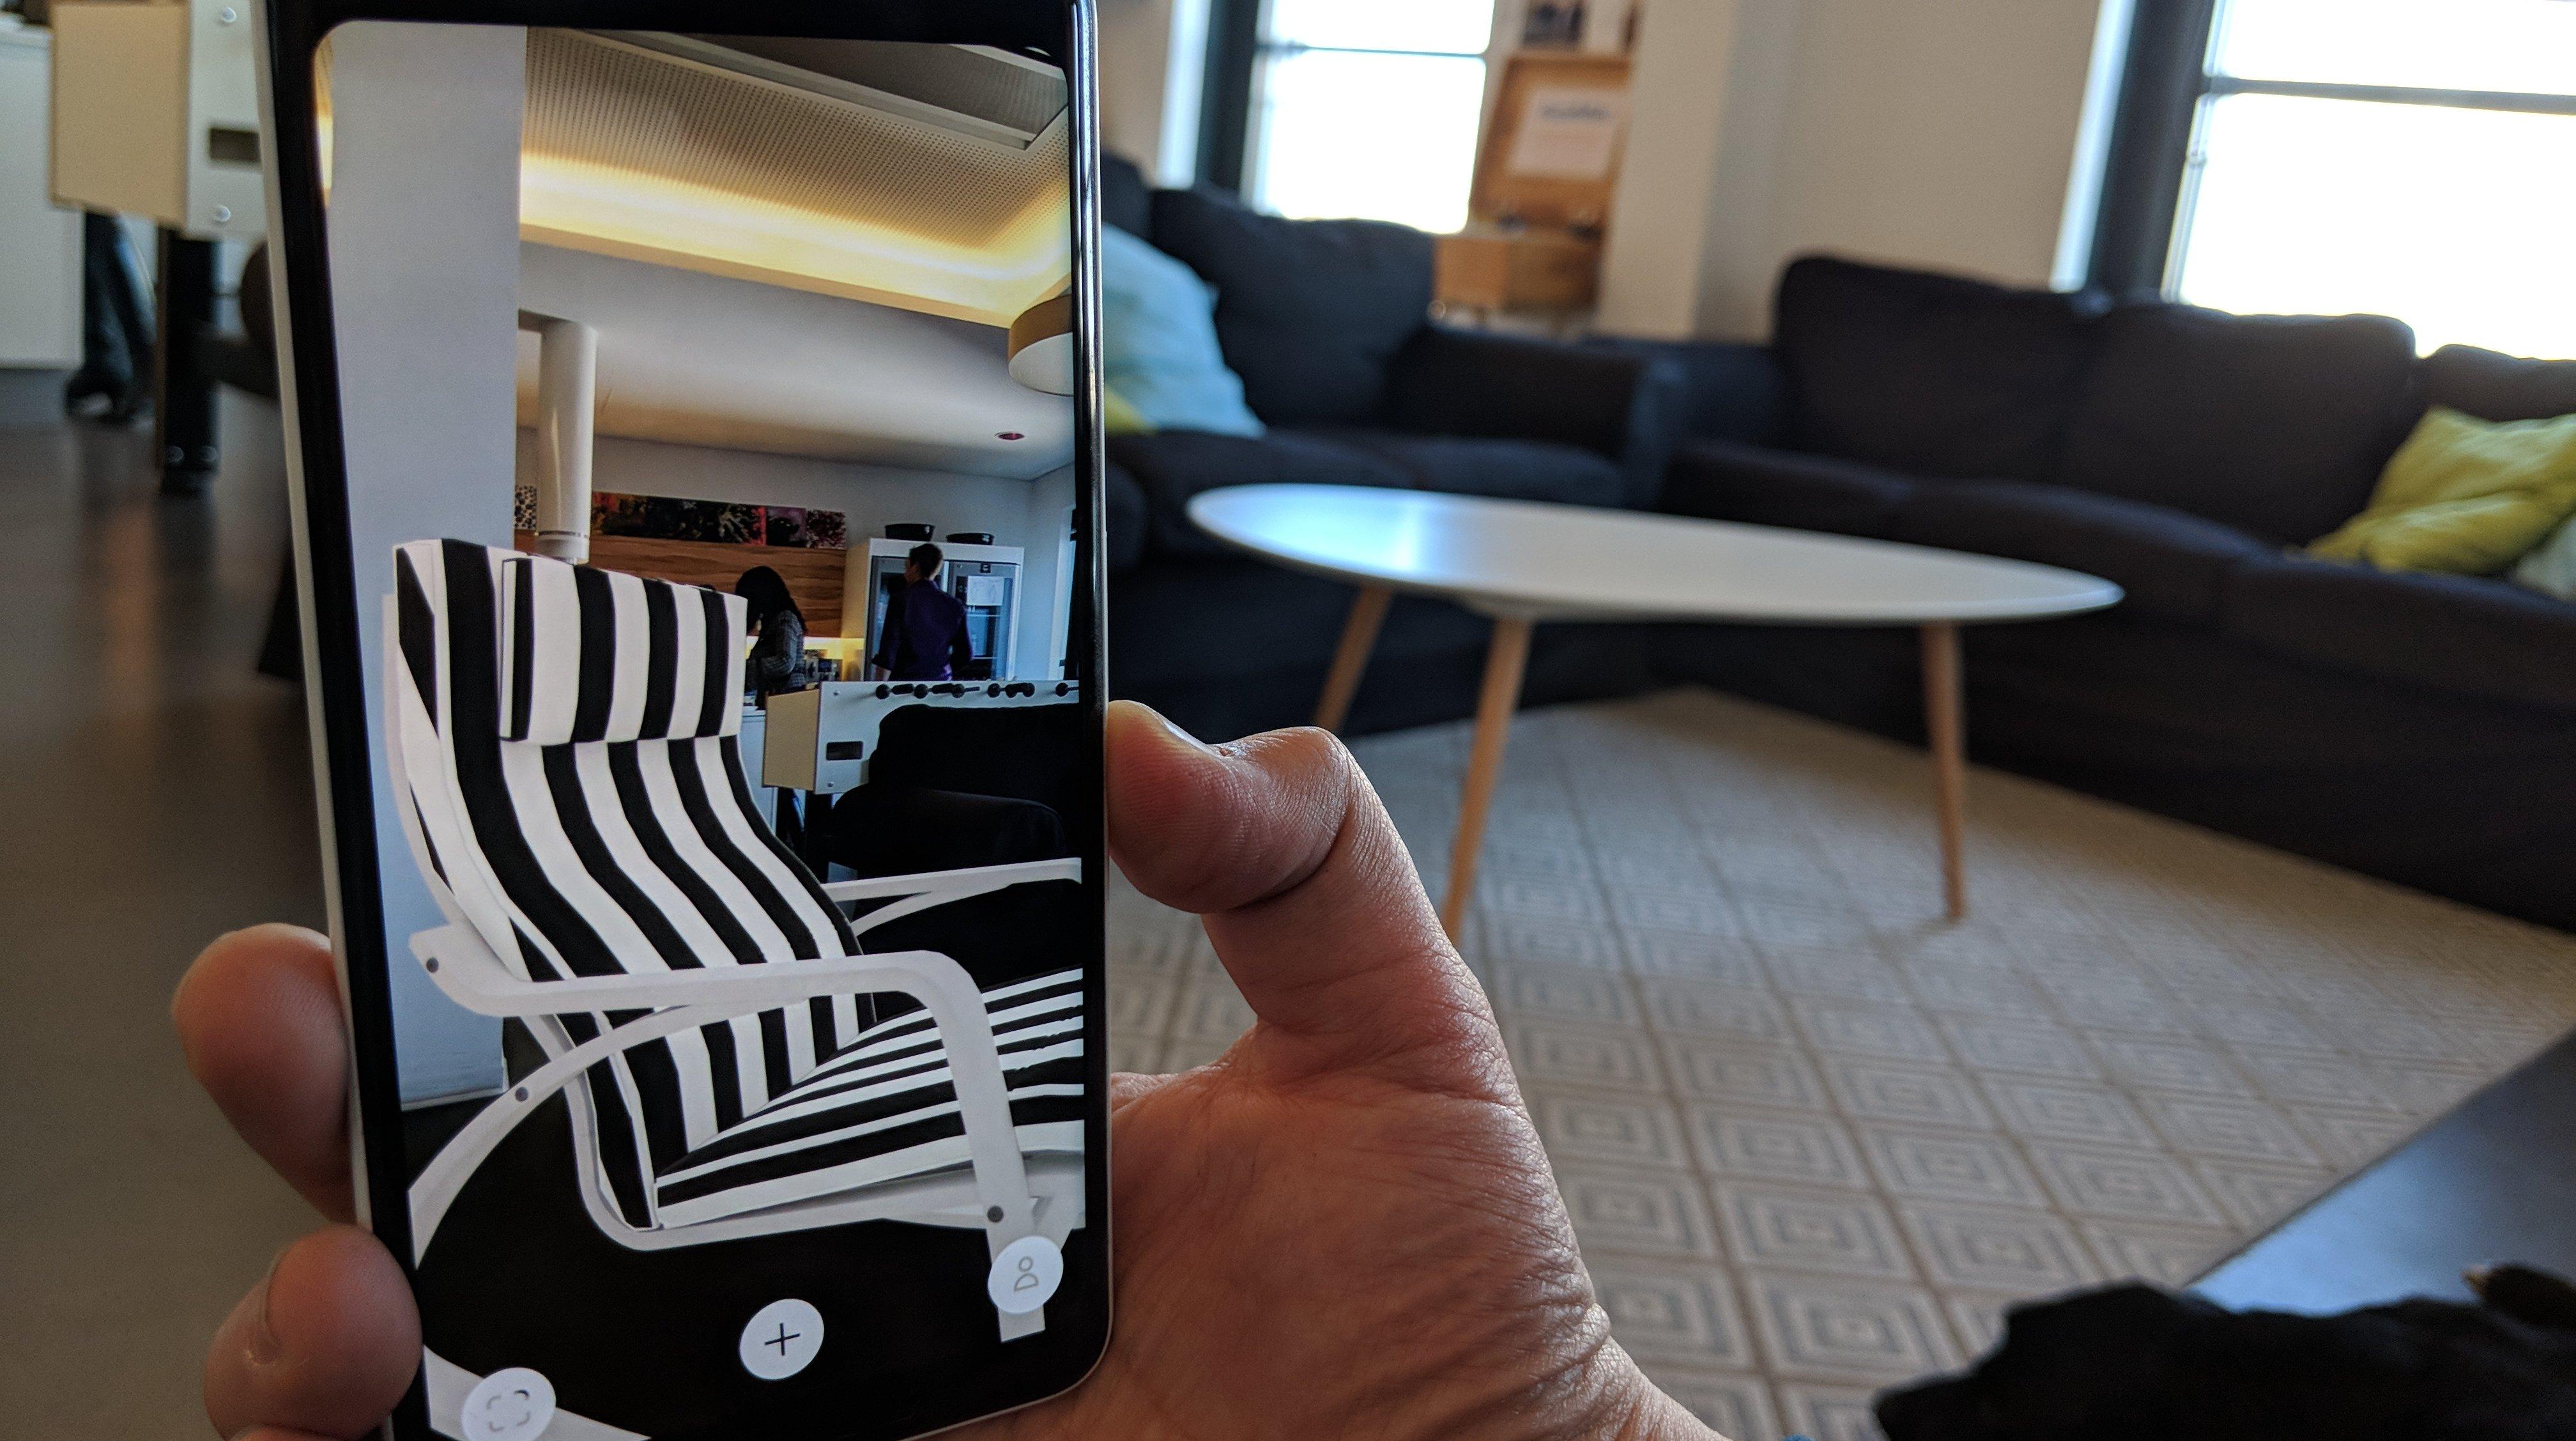 ikea place arcore app verr t welche couch wirklich ins wohnzimmer passt androidpit. Black Bedroom Furniture Sets. Home Design Ideas